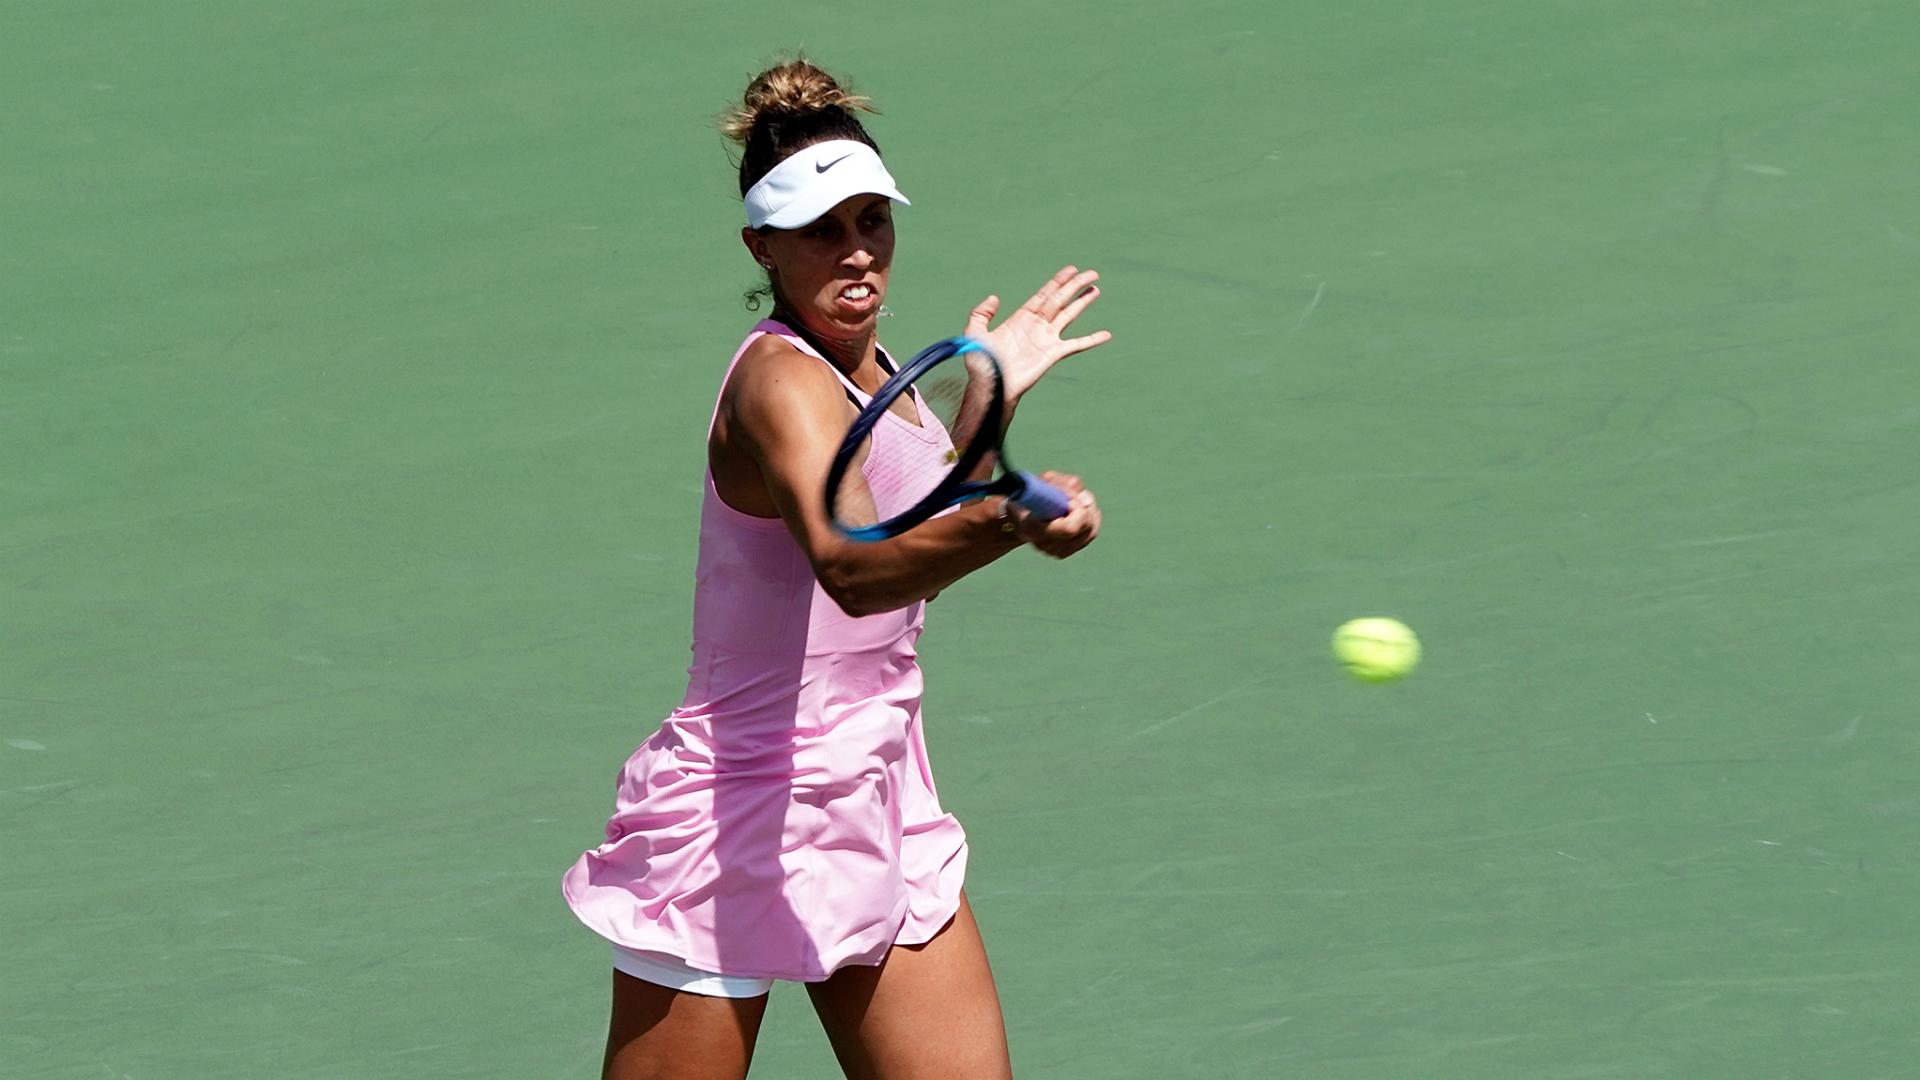 Madison Keys on her way to beating Daria Kasatkina